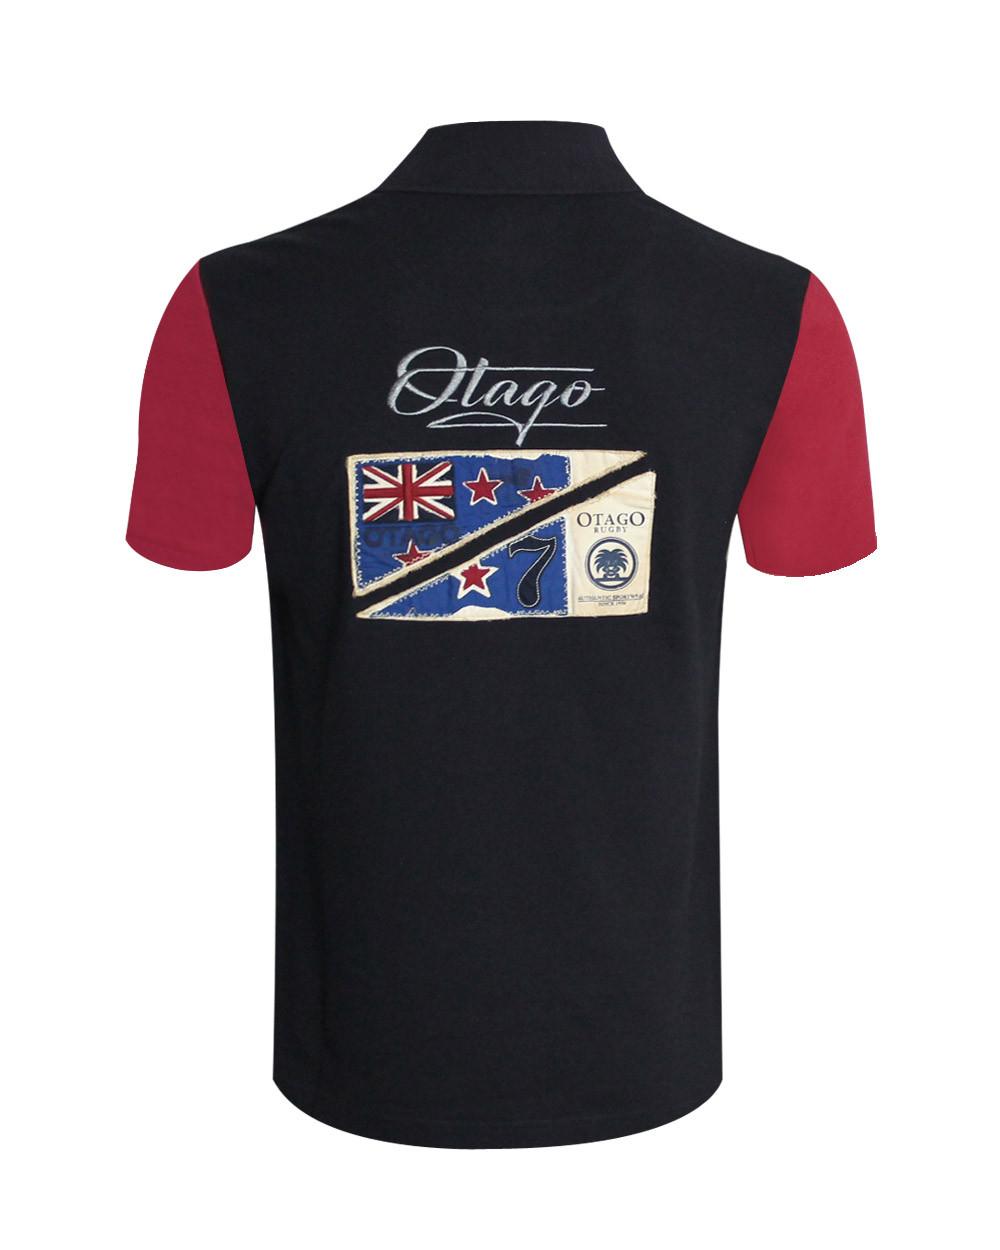 Polo Divota Otago rugby marine manches courtes bordeaux homme